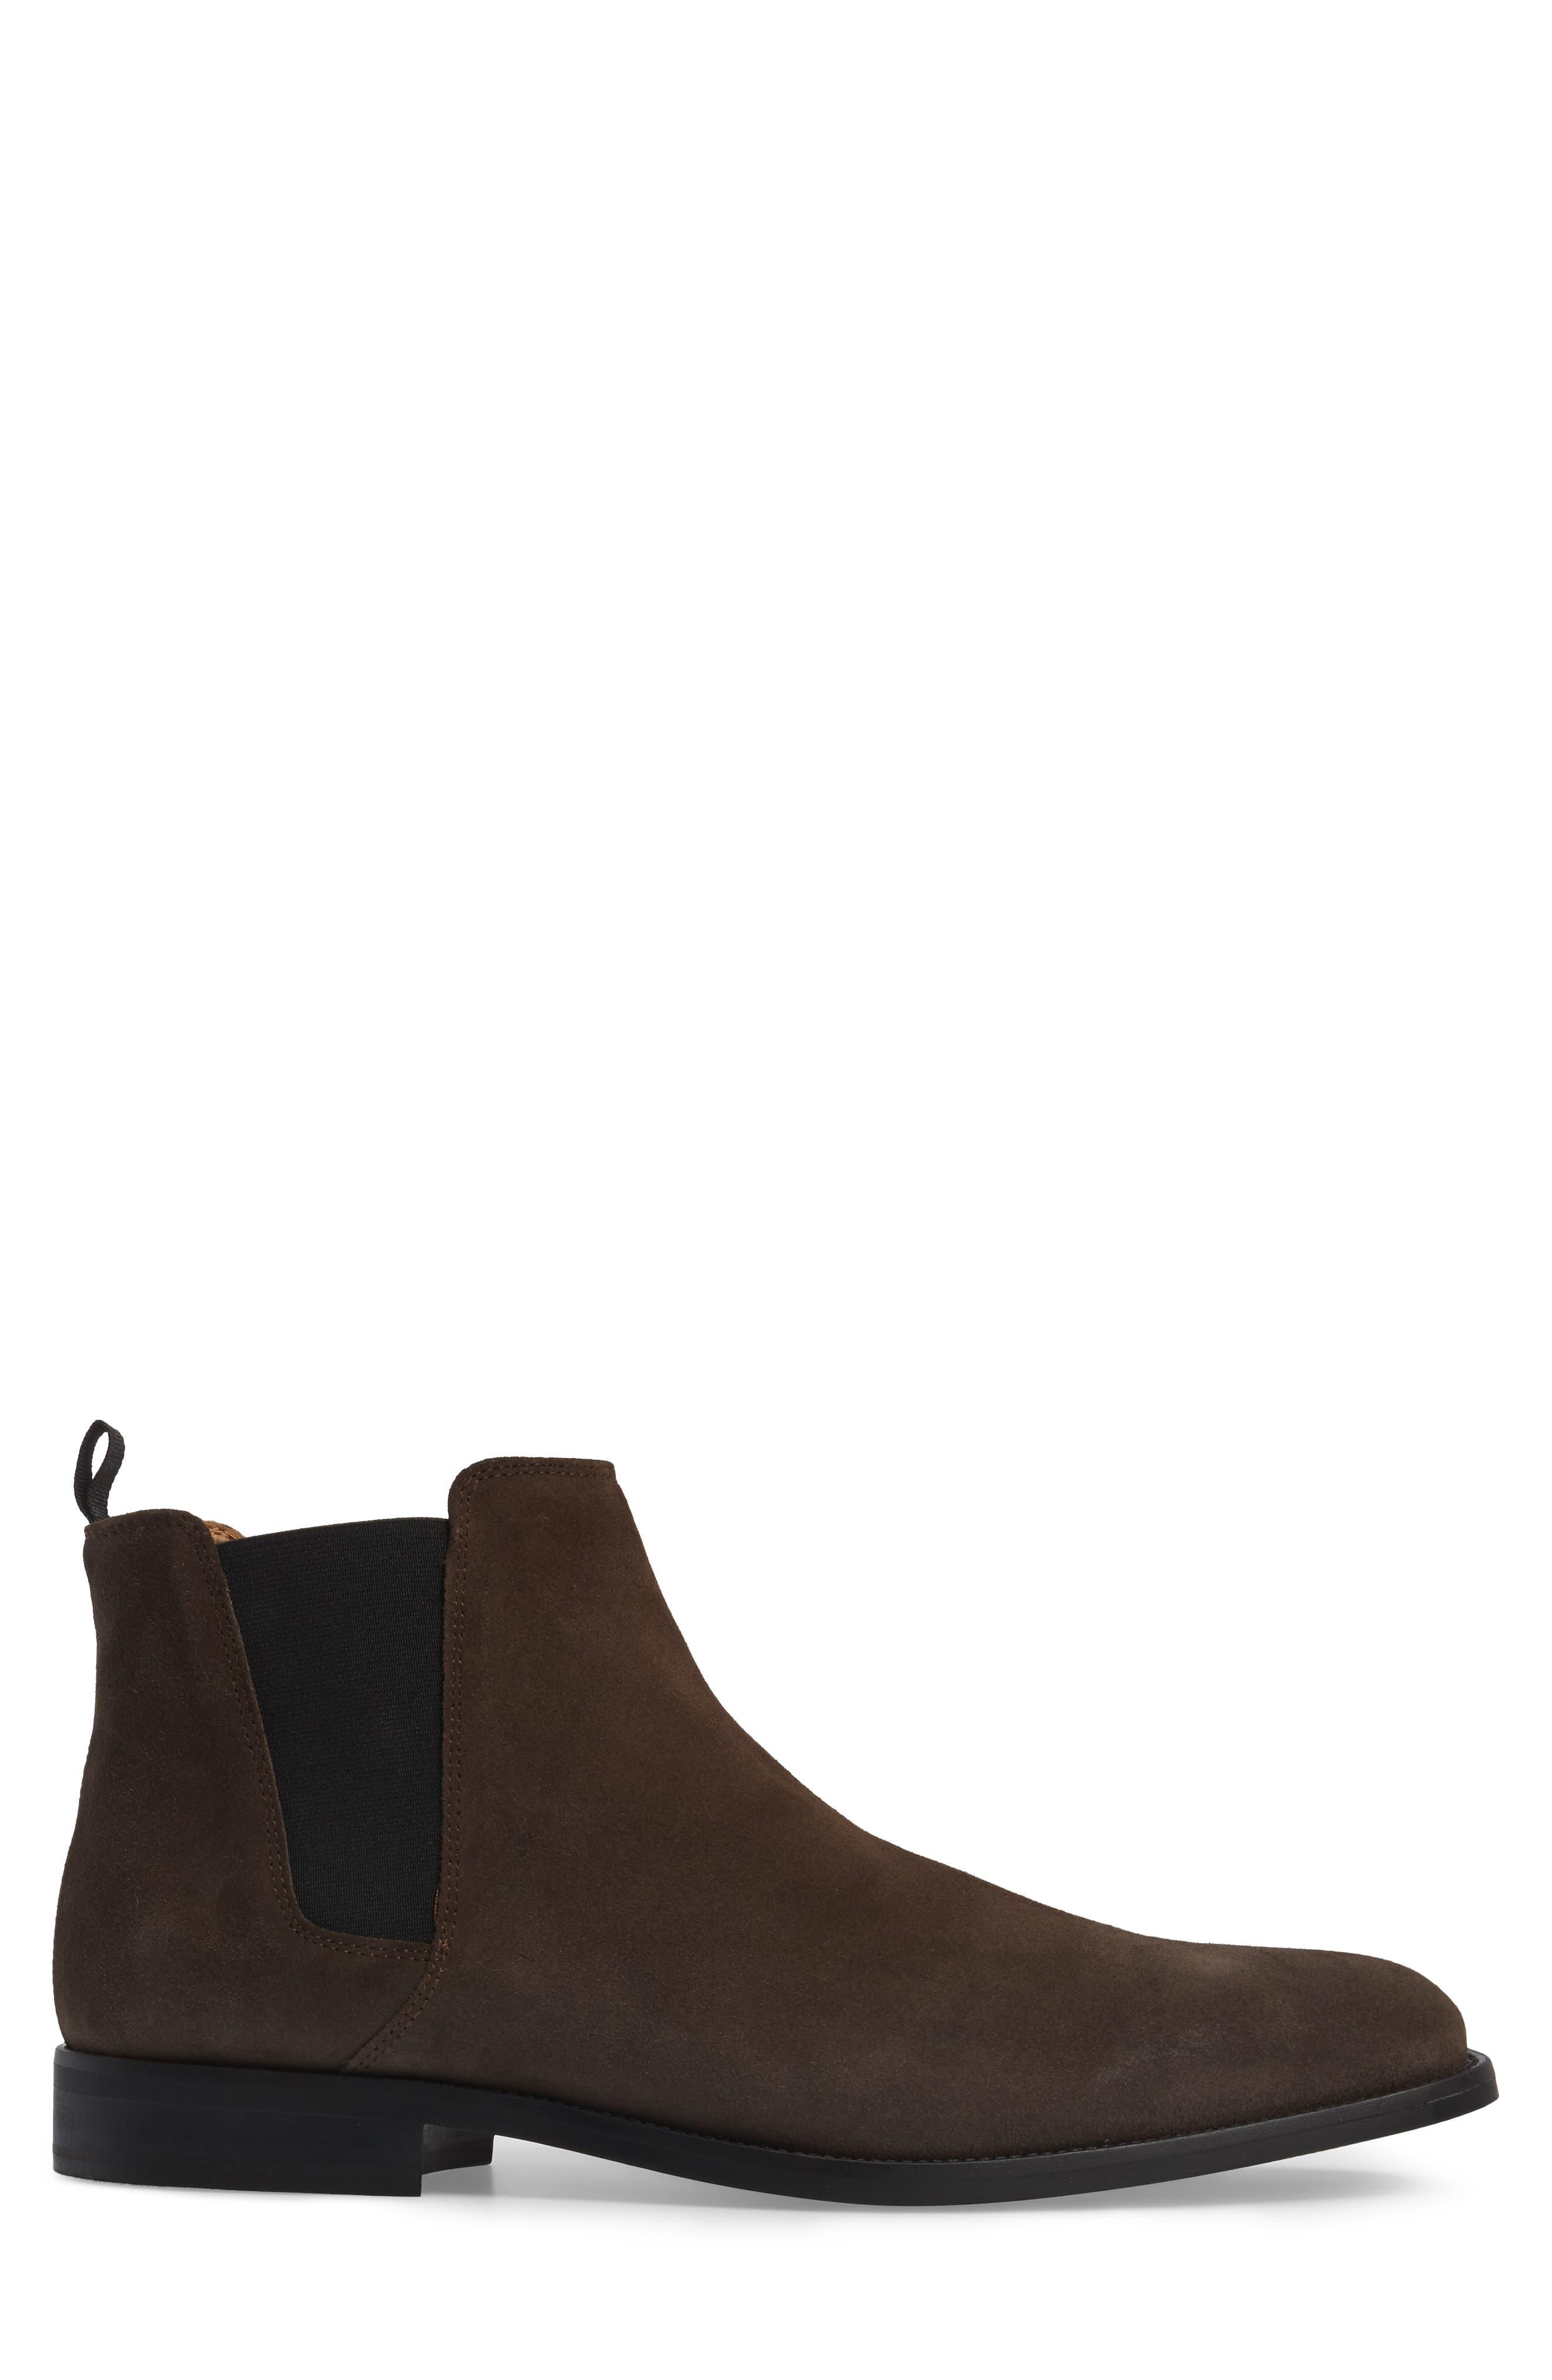 Vianello Chelsea Boot,                             Alternate thumbnail 3, color,                             021